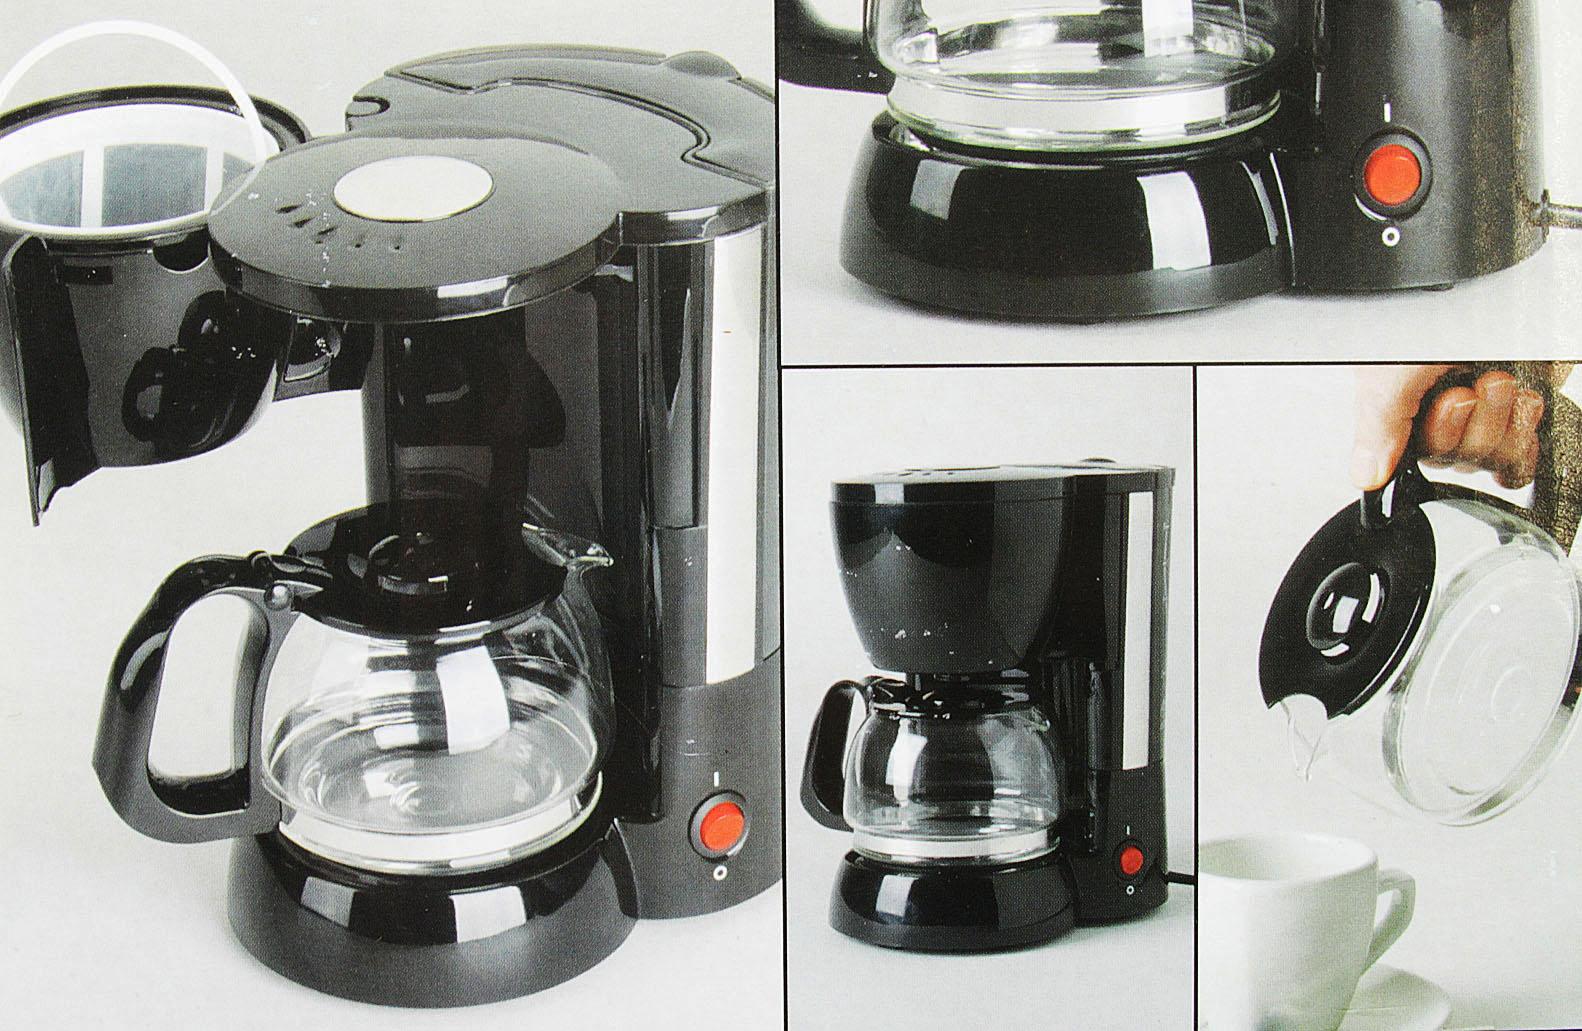 kaffeemaschine kaffee maschine neu 12 v auto. Black Bedroom Furniture Sets. Home Design Ideas